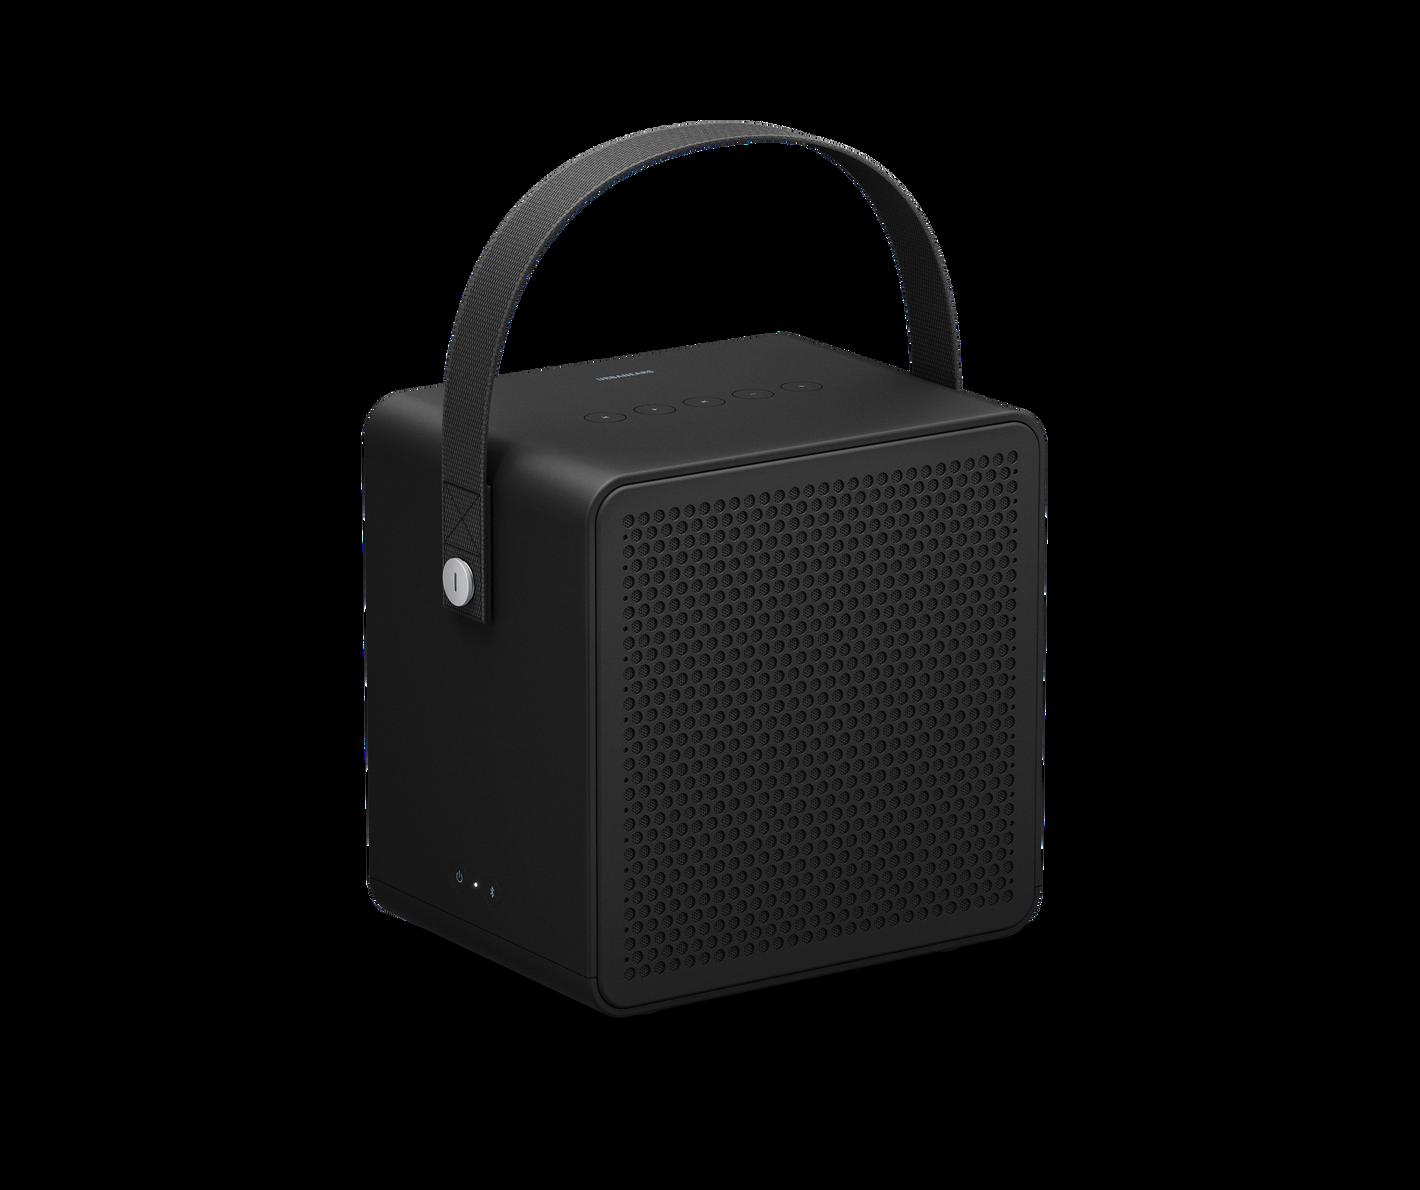 Urbanears Rålis Portable Speaker - Charcoal Black